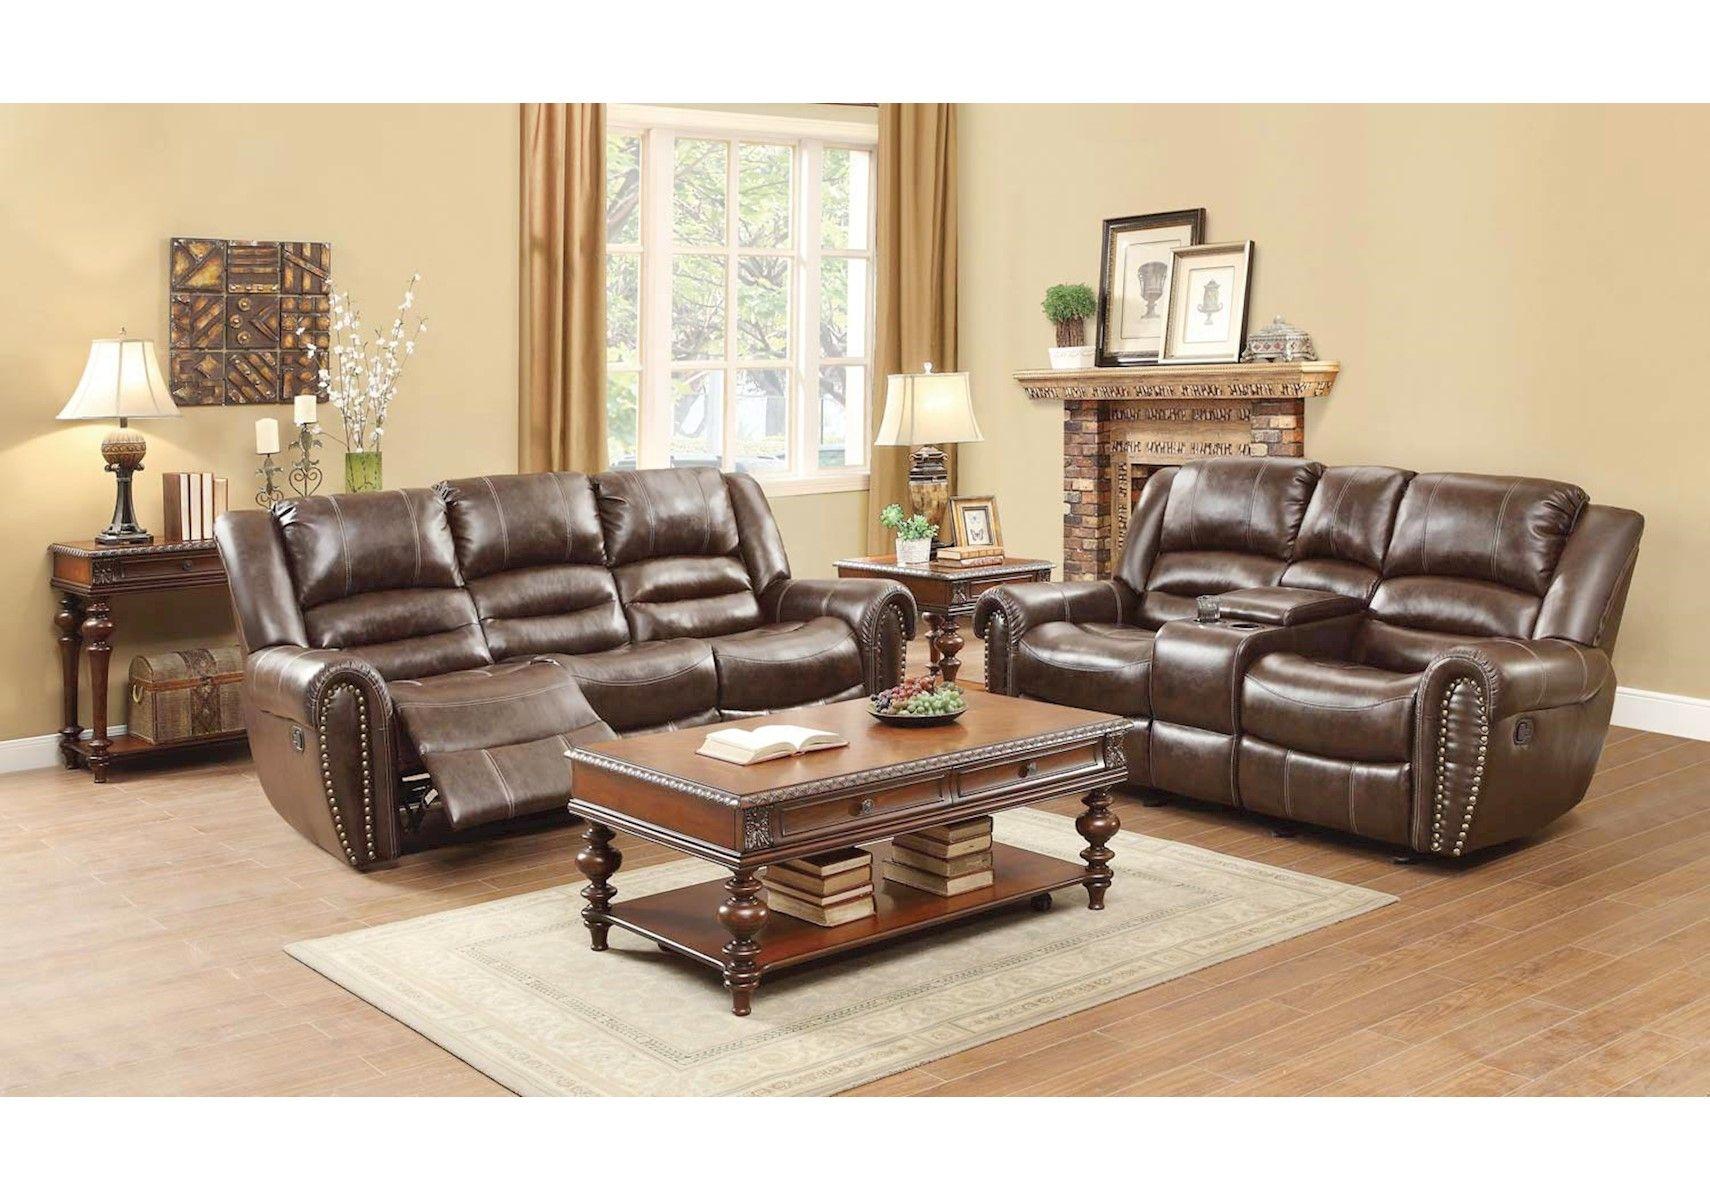 Lacks Center Hill 2 Pc Living Room Set Living Room Leather